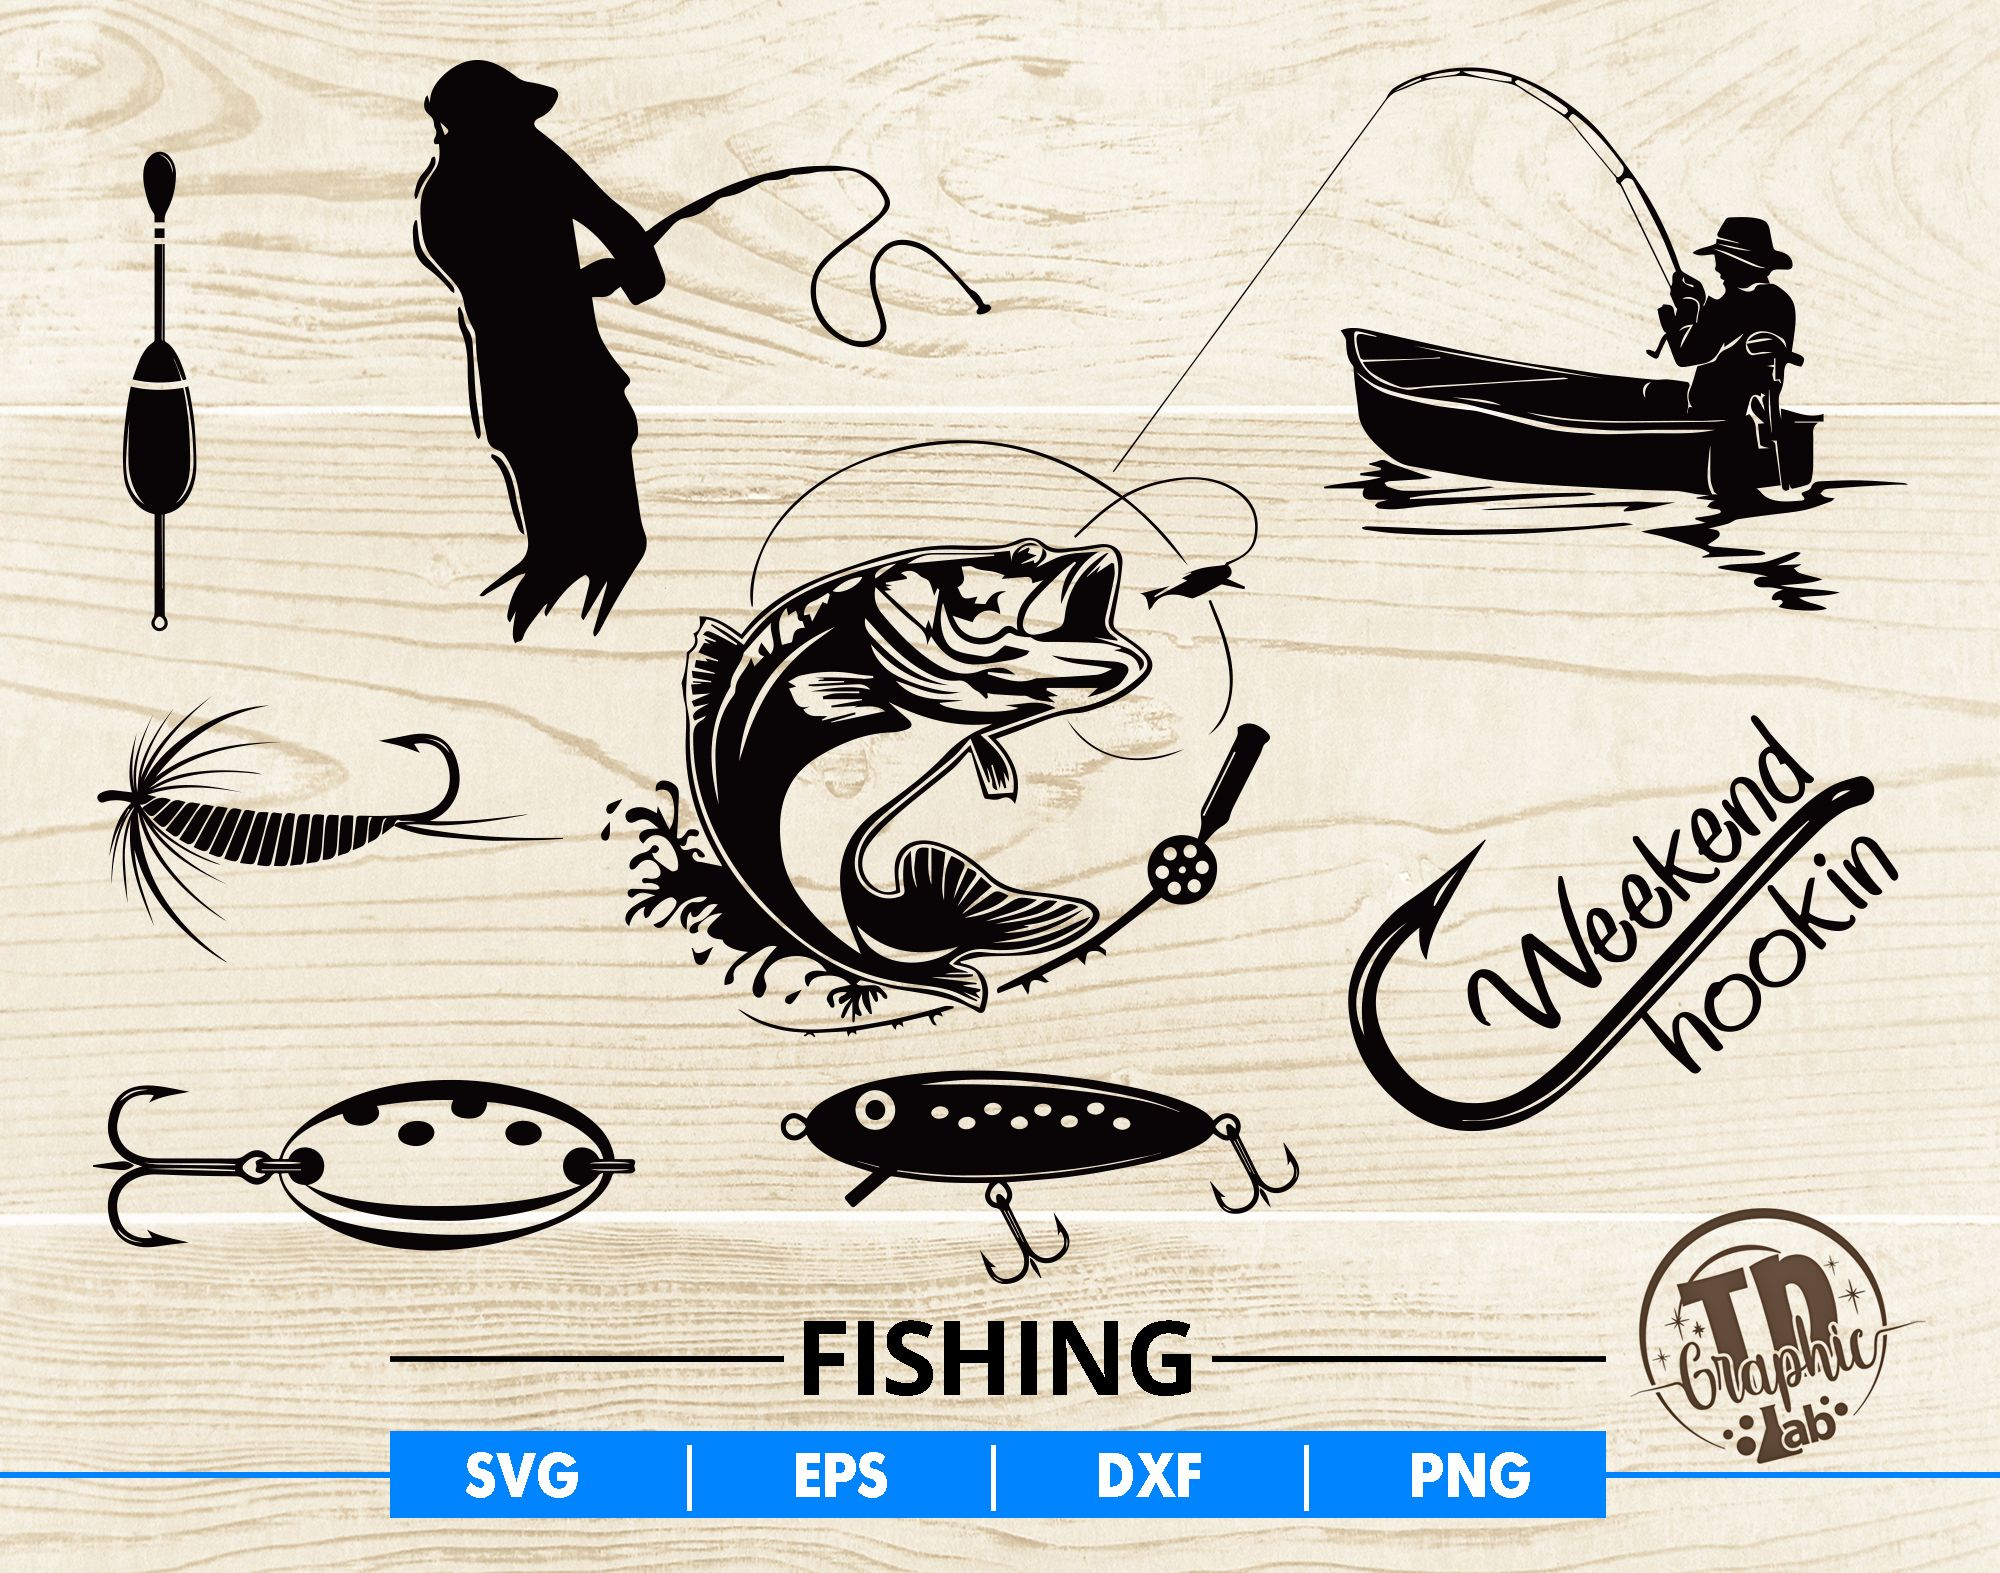 Download Fishing Svg Fishing Hook Svg Fisherman Svg Fishing Clipart Fishing Vector Fish Clipart Fishing Svg Fish Clipart Fishing Decals